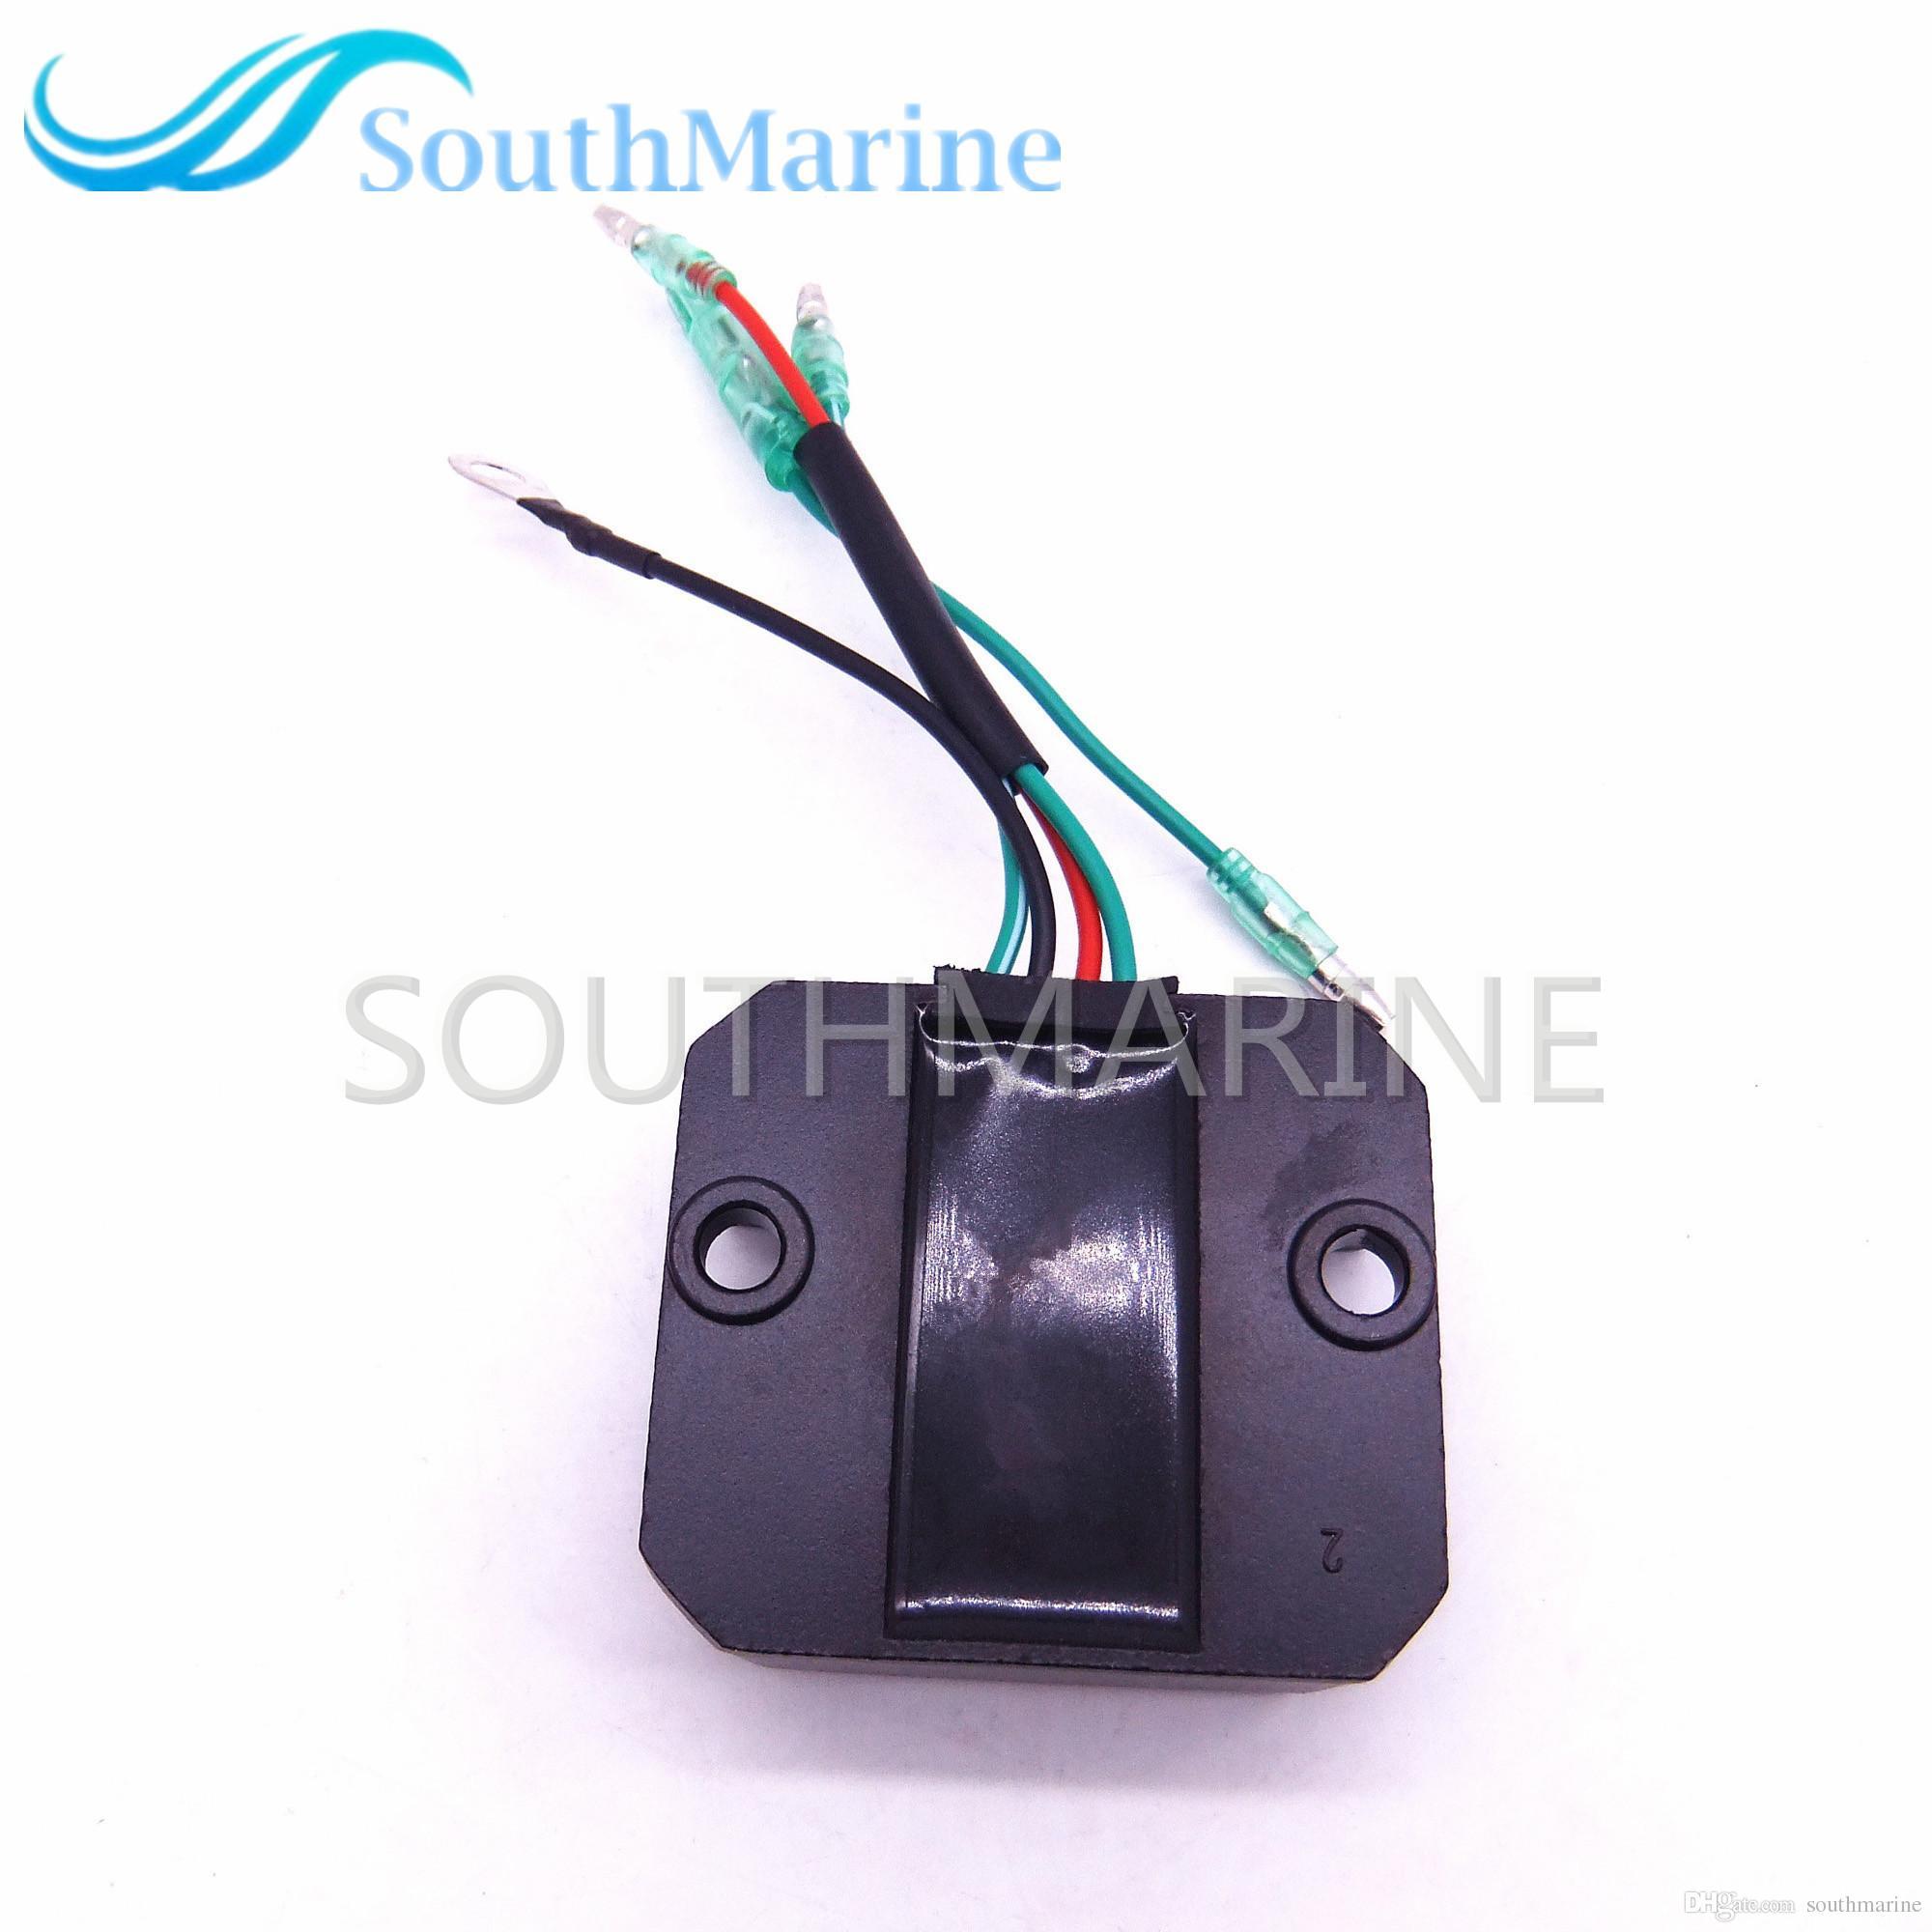 Regulator Boat Wiring Electrical Diagrams Voltage 6ah 81960 00 Motor Rectifier For Yamaha 4 Stroke Harley Diagram